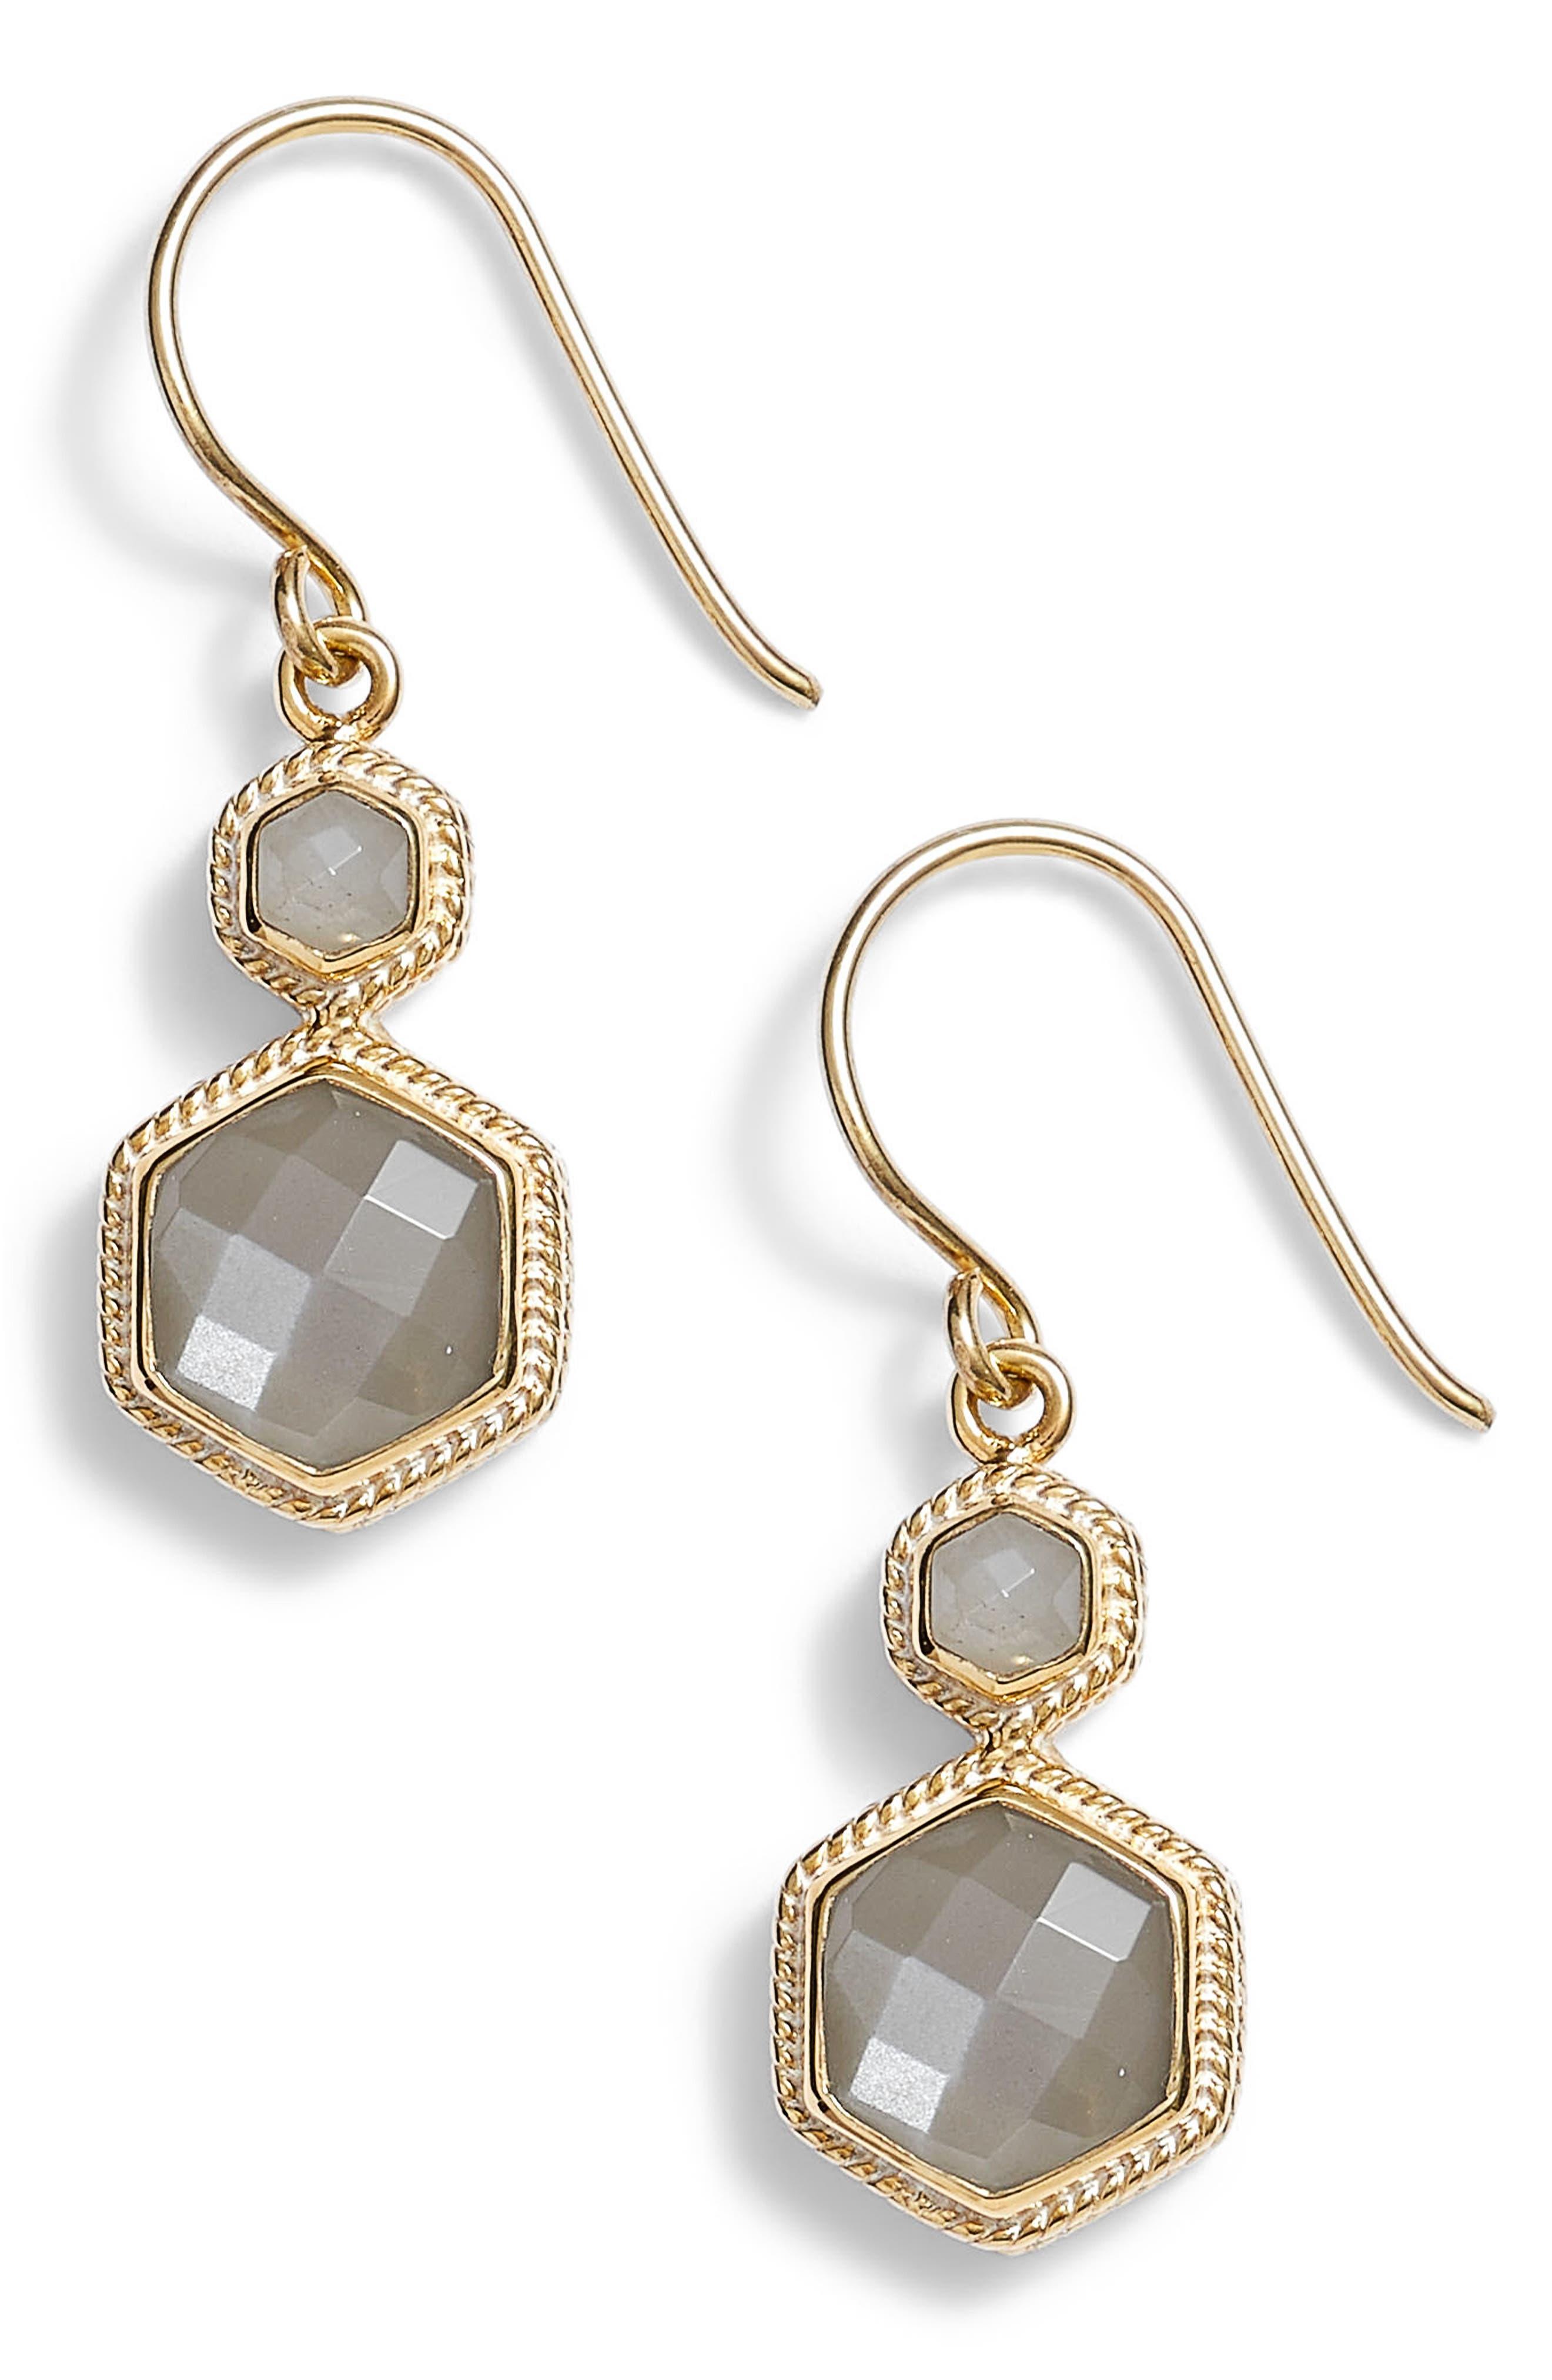 Grey Moonstone Double Drop Earrings,                         Main,                         color, Gold/ Grey Moonstone